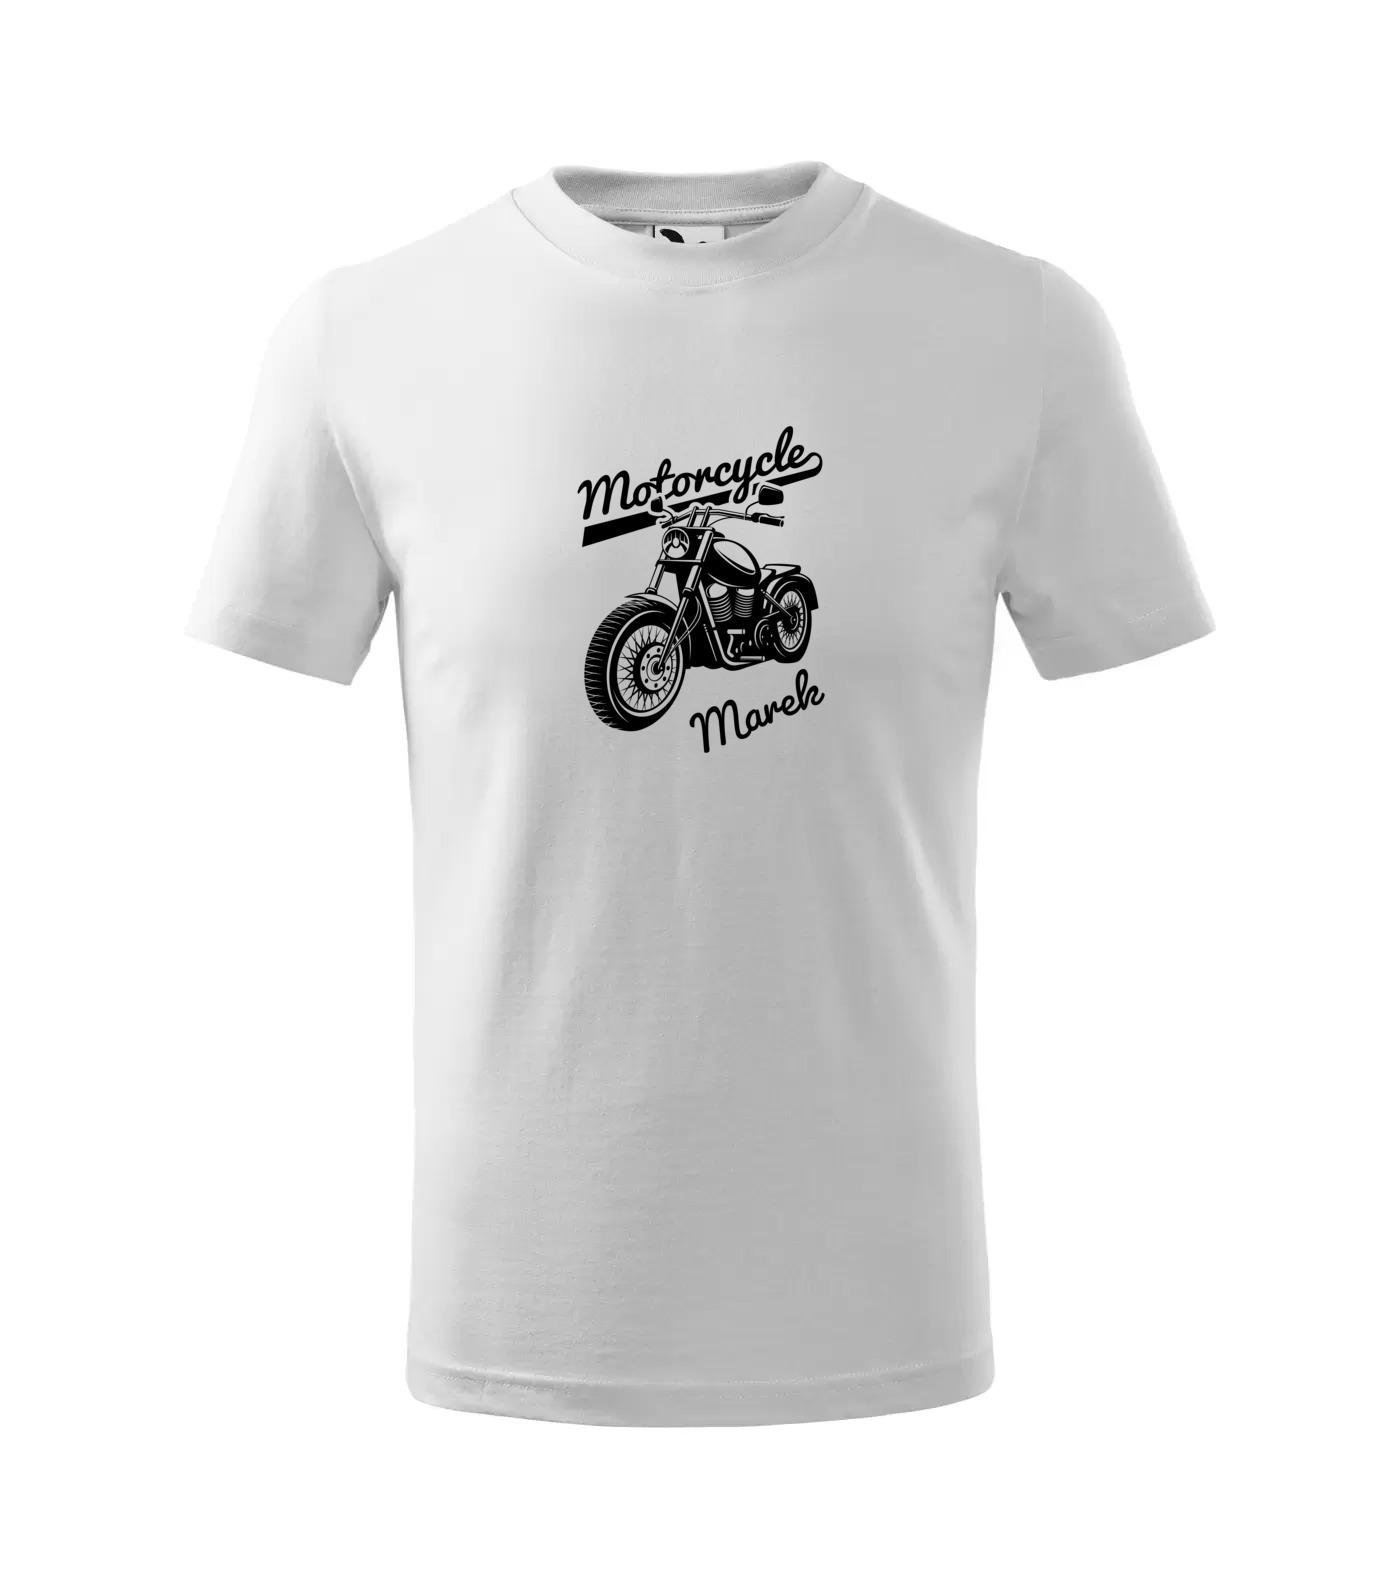 Tričko Motorkář Inverse Marek